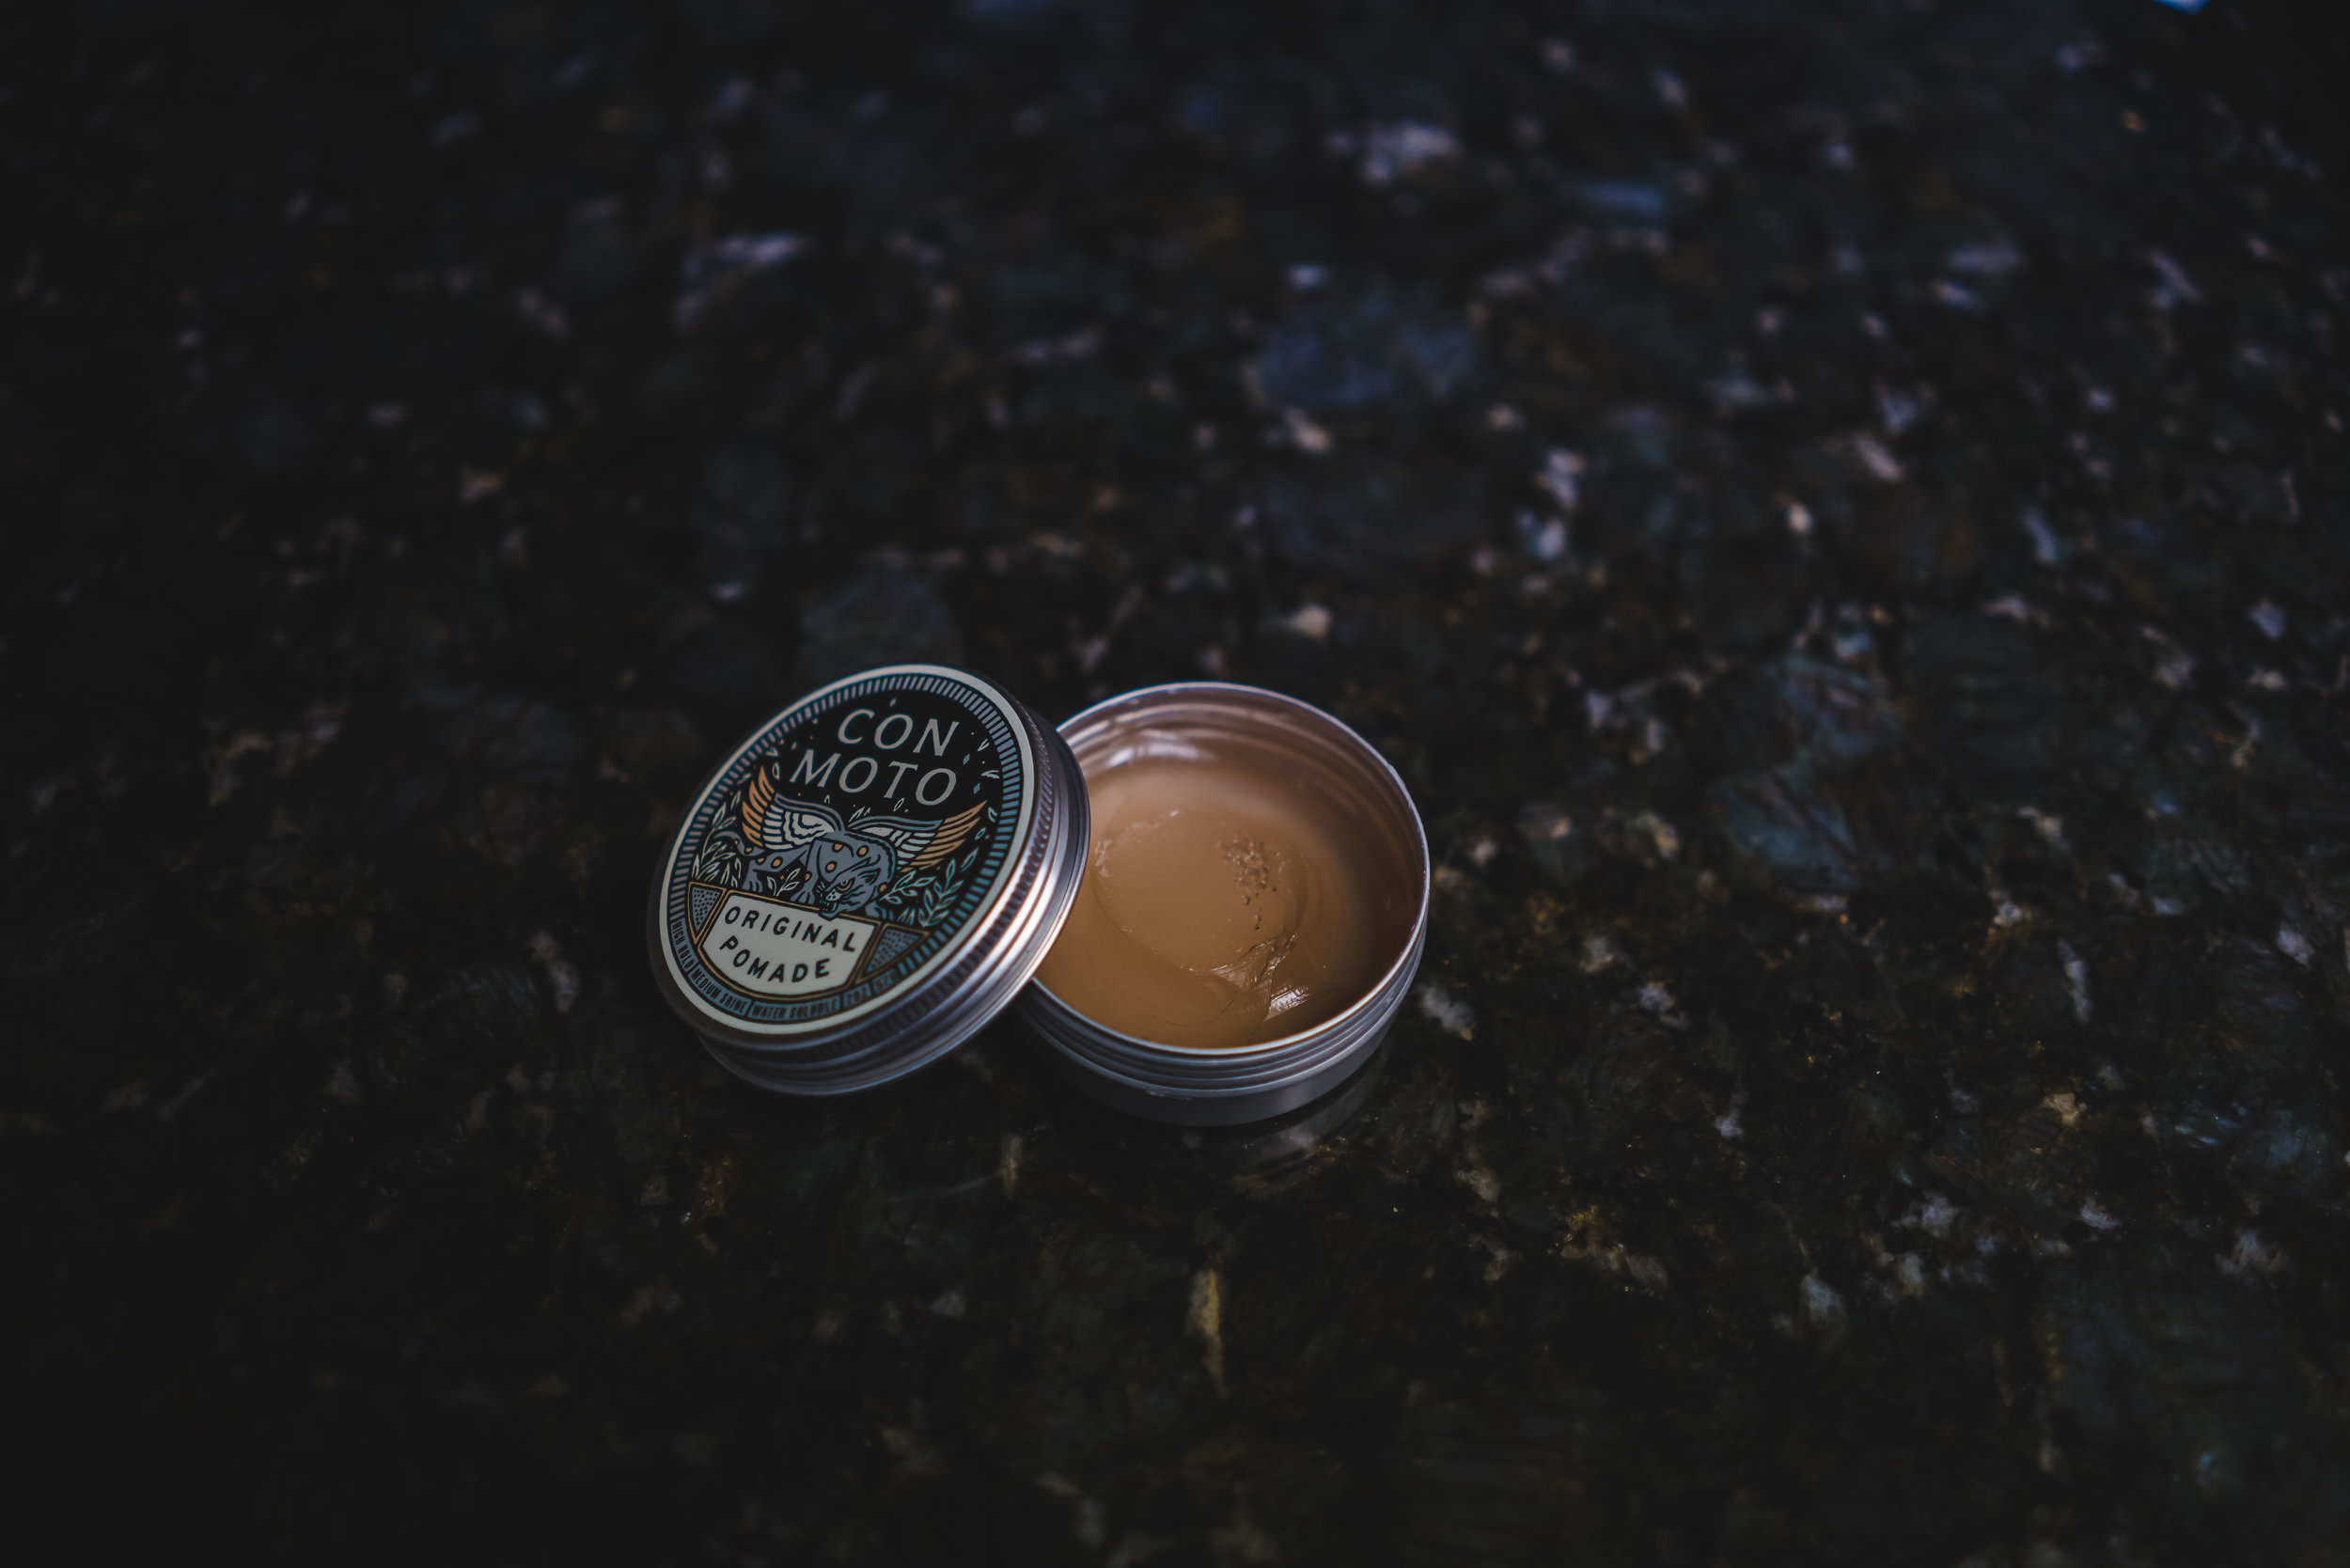 2019_The Pomp_Con Moto_Original Pomade_Jar-3.jpg